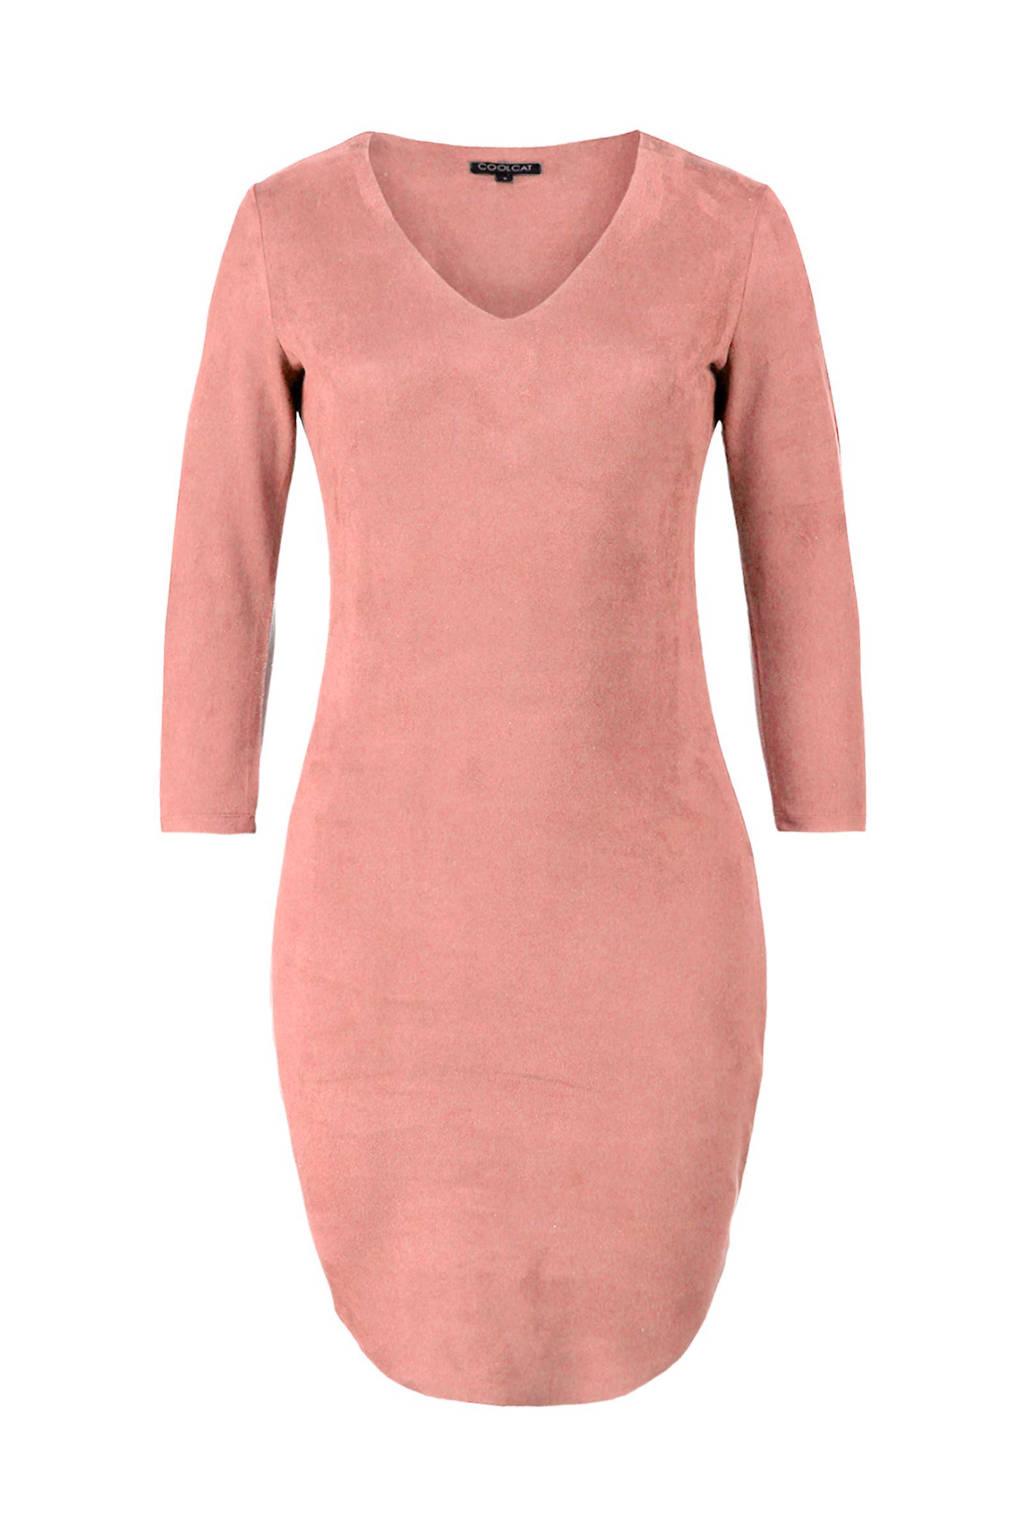 Super CoolCat suèdine jurk lichtroze | wehkamp MS-39